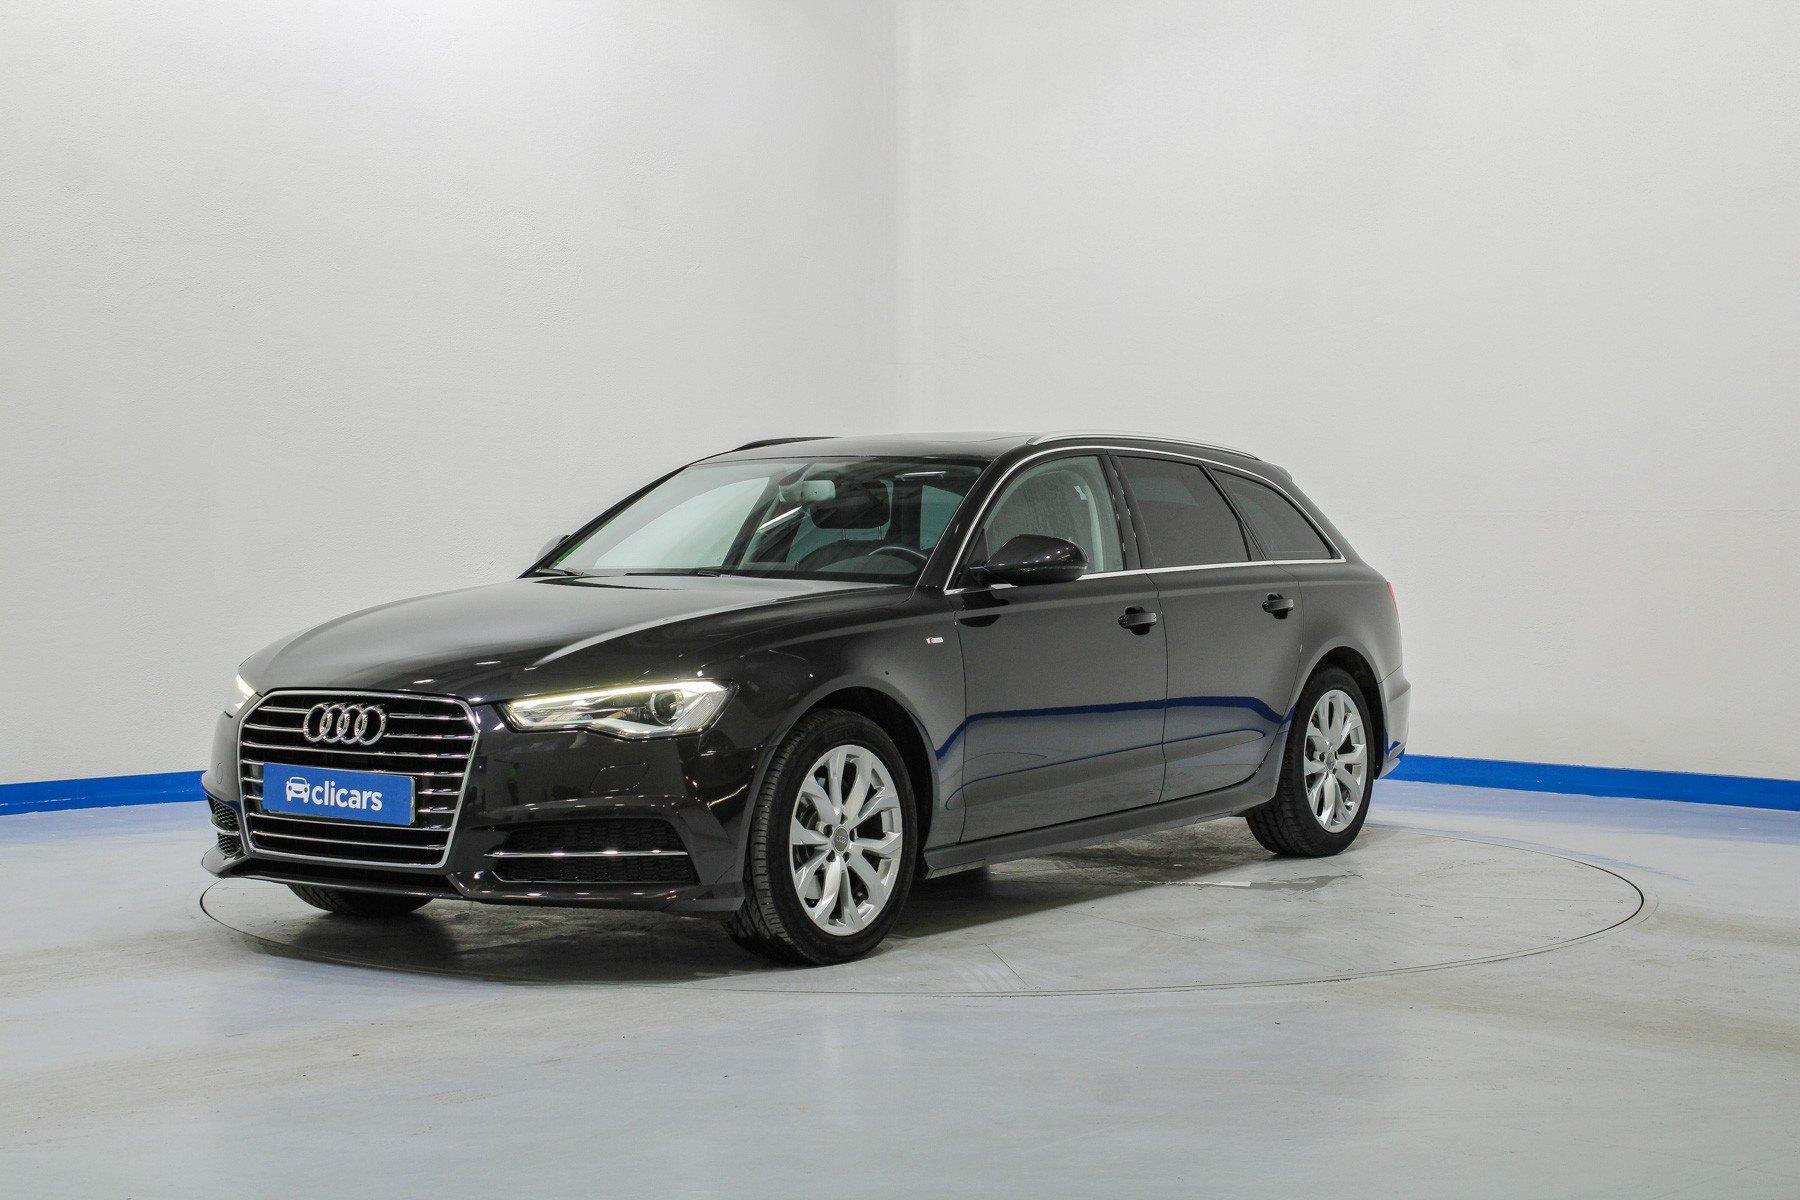 Audi A6 Diésel Avant 2.0 TDI 190CV ultra S tron S line 1